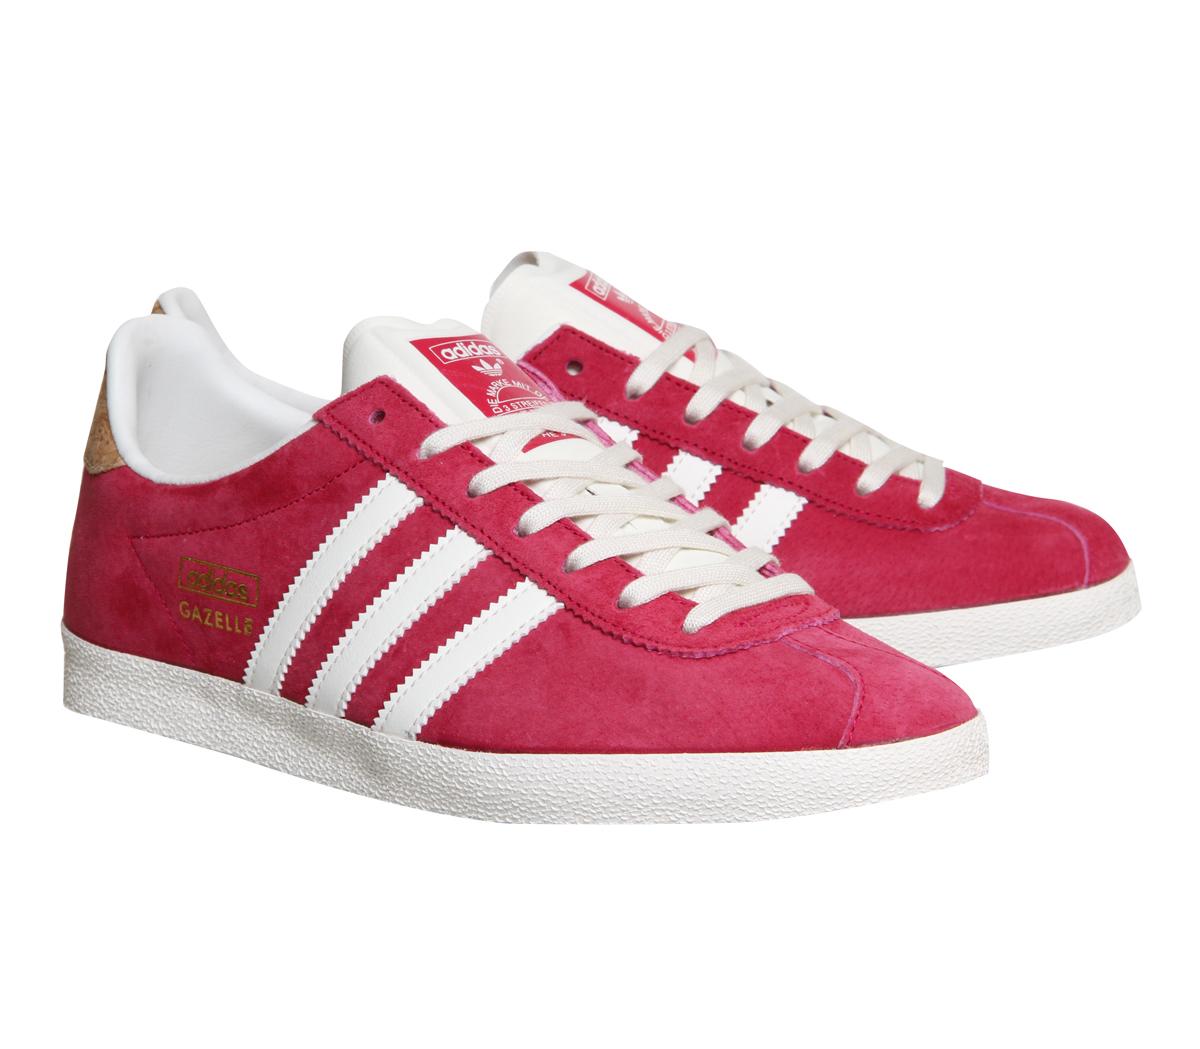 adidas gazelle og w rose